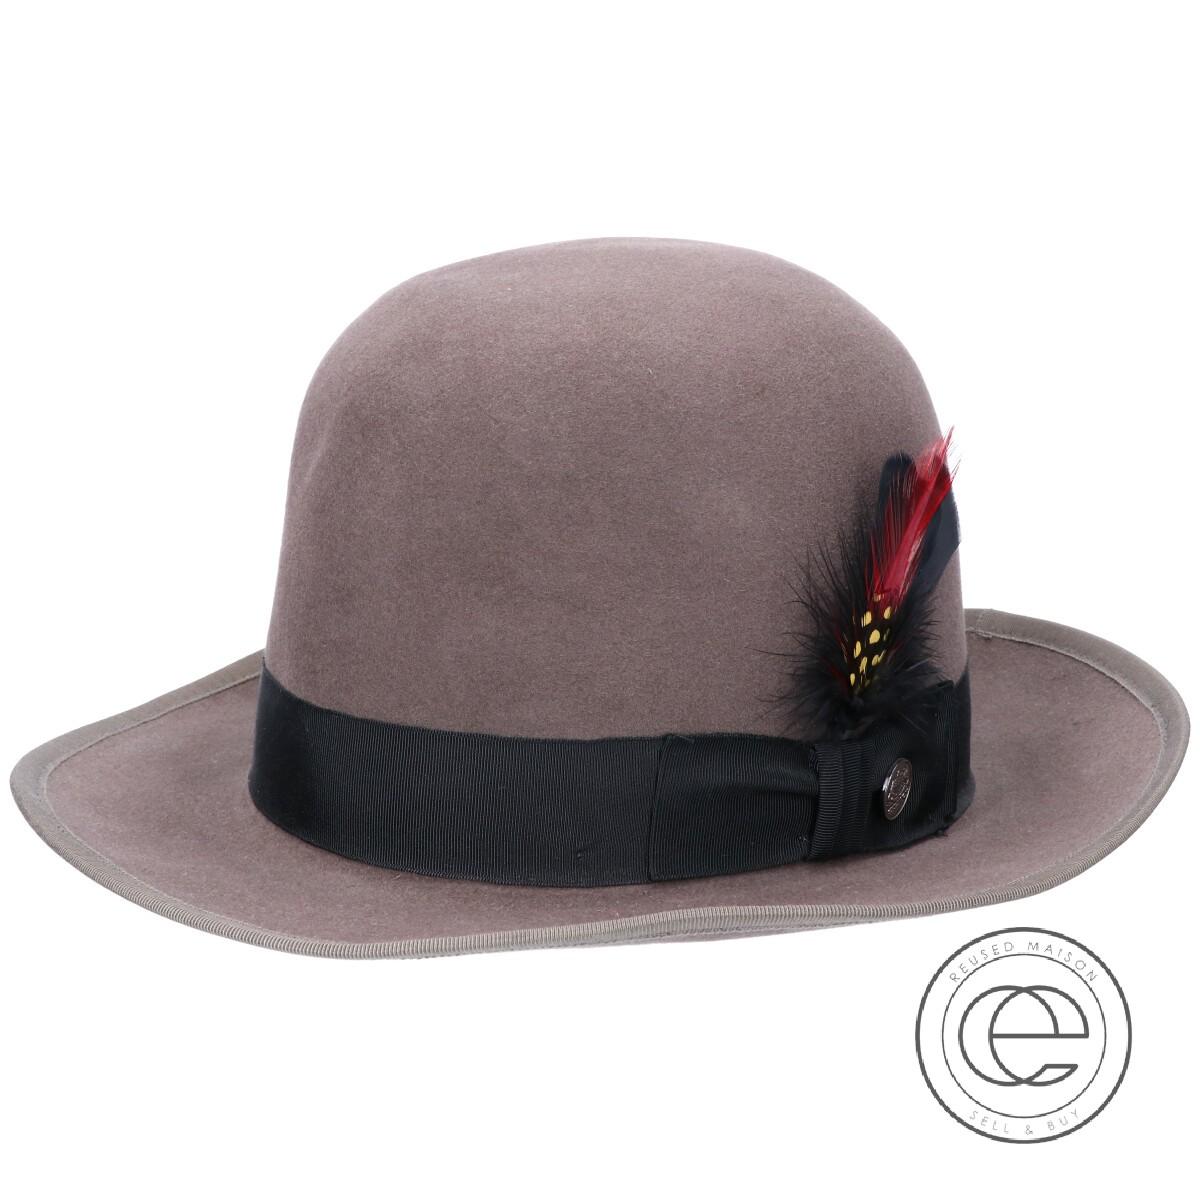 STETSON ステットソン Premier Whippet プレミアウィペット 150周年記念 ラビットファーフェルトハット 帽子 59 CARIBOU メンズ 【中古】